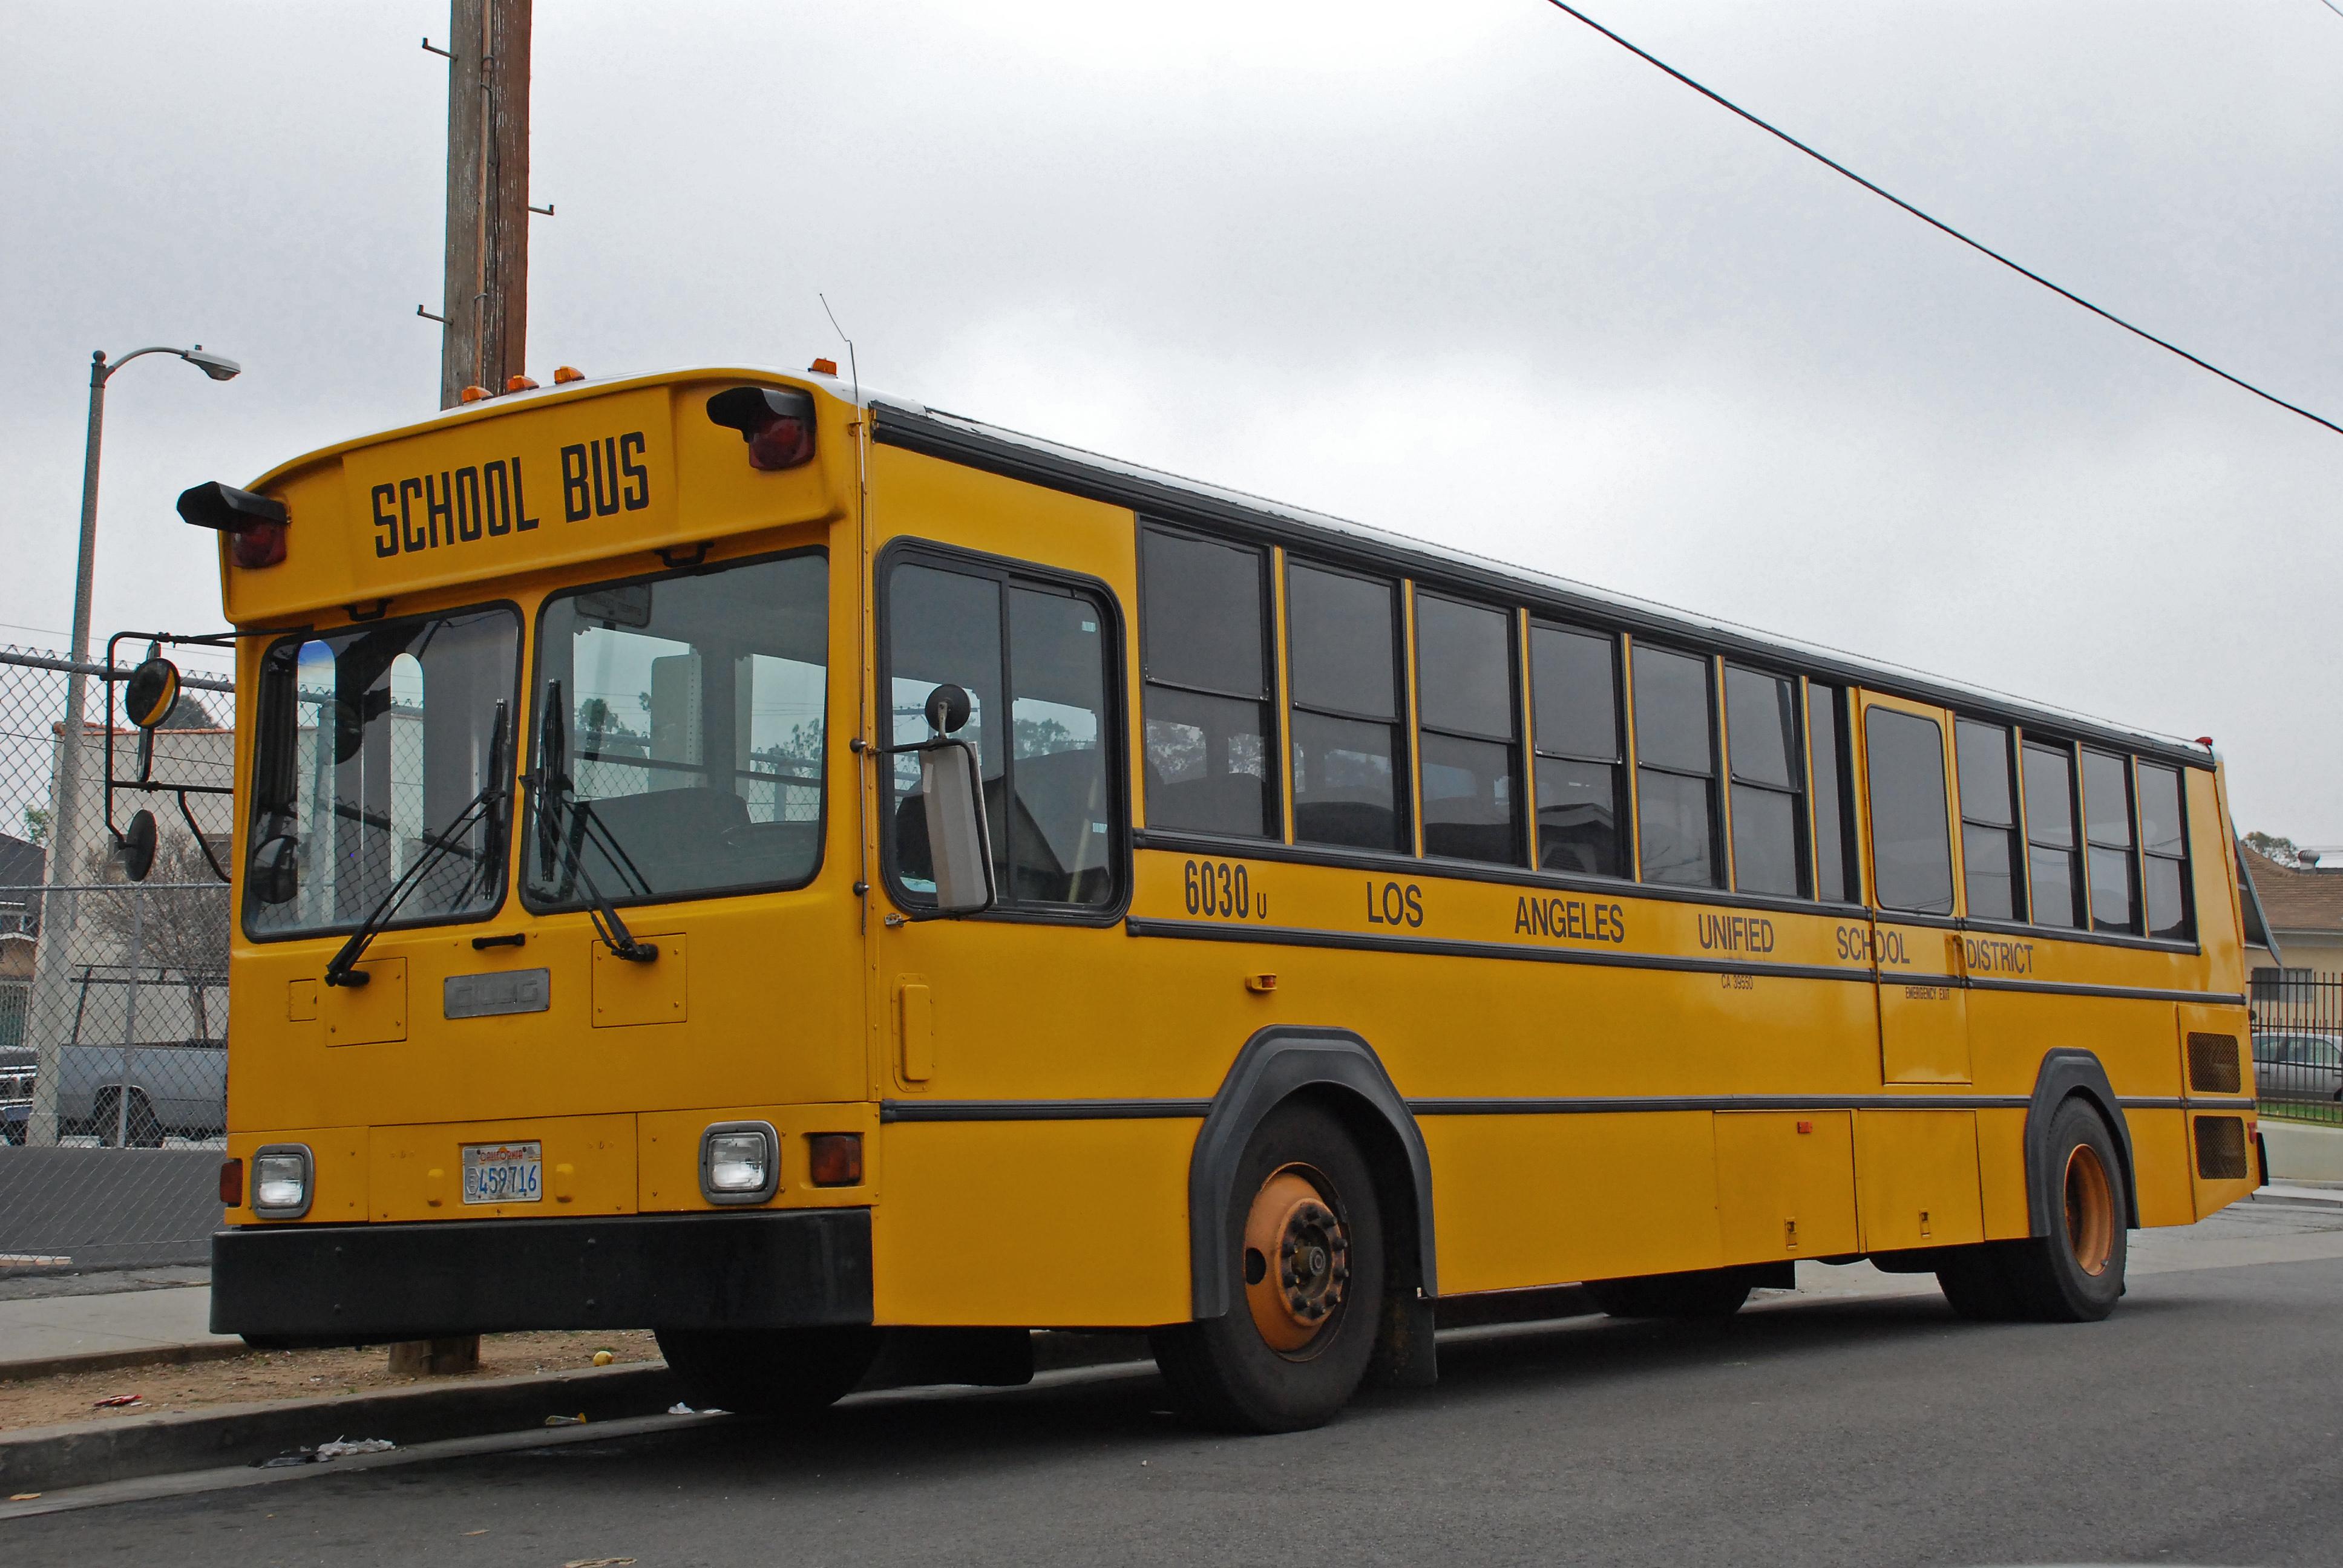 FileGillig Phantom School Bus LAUSDjpg   Wikimedia Commons 3872x2592